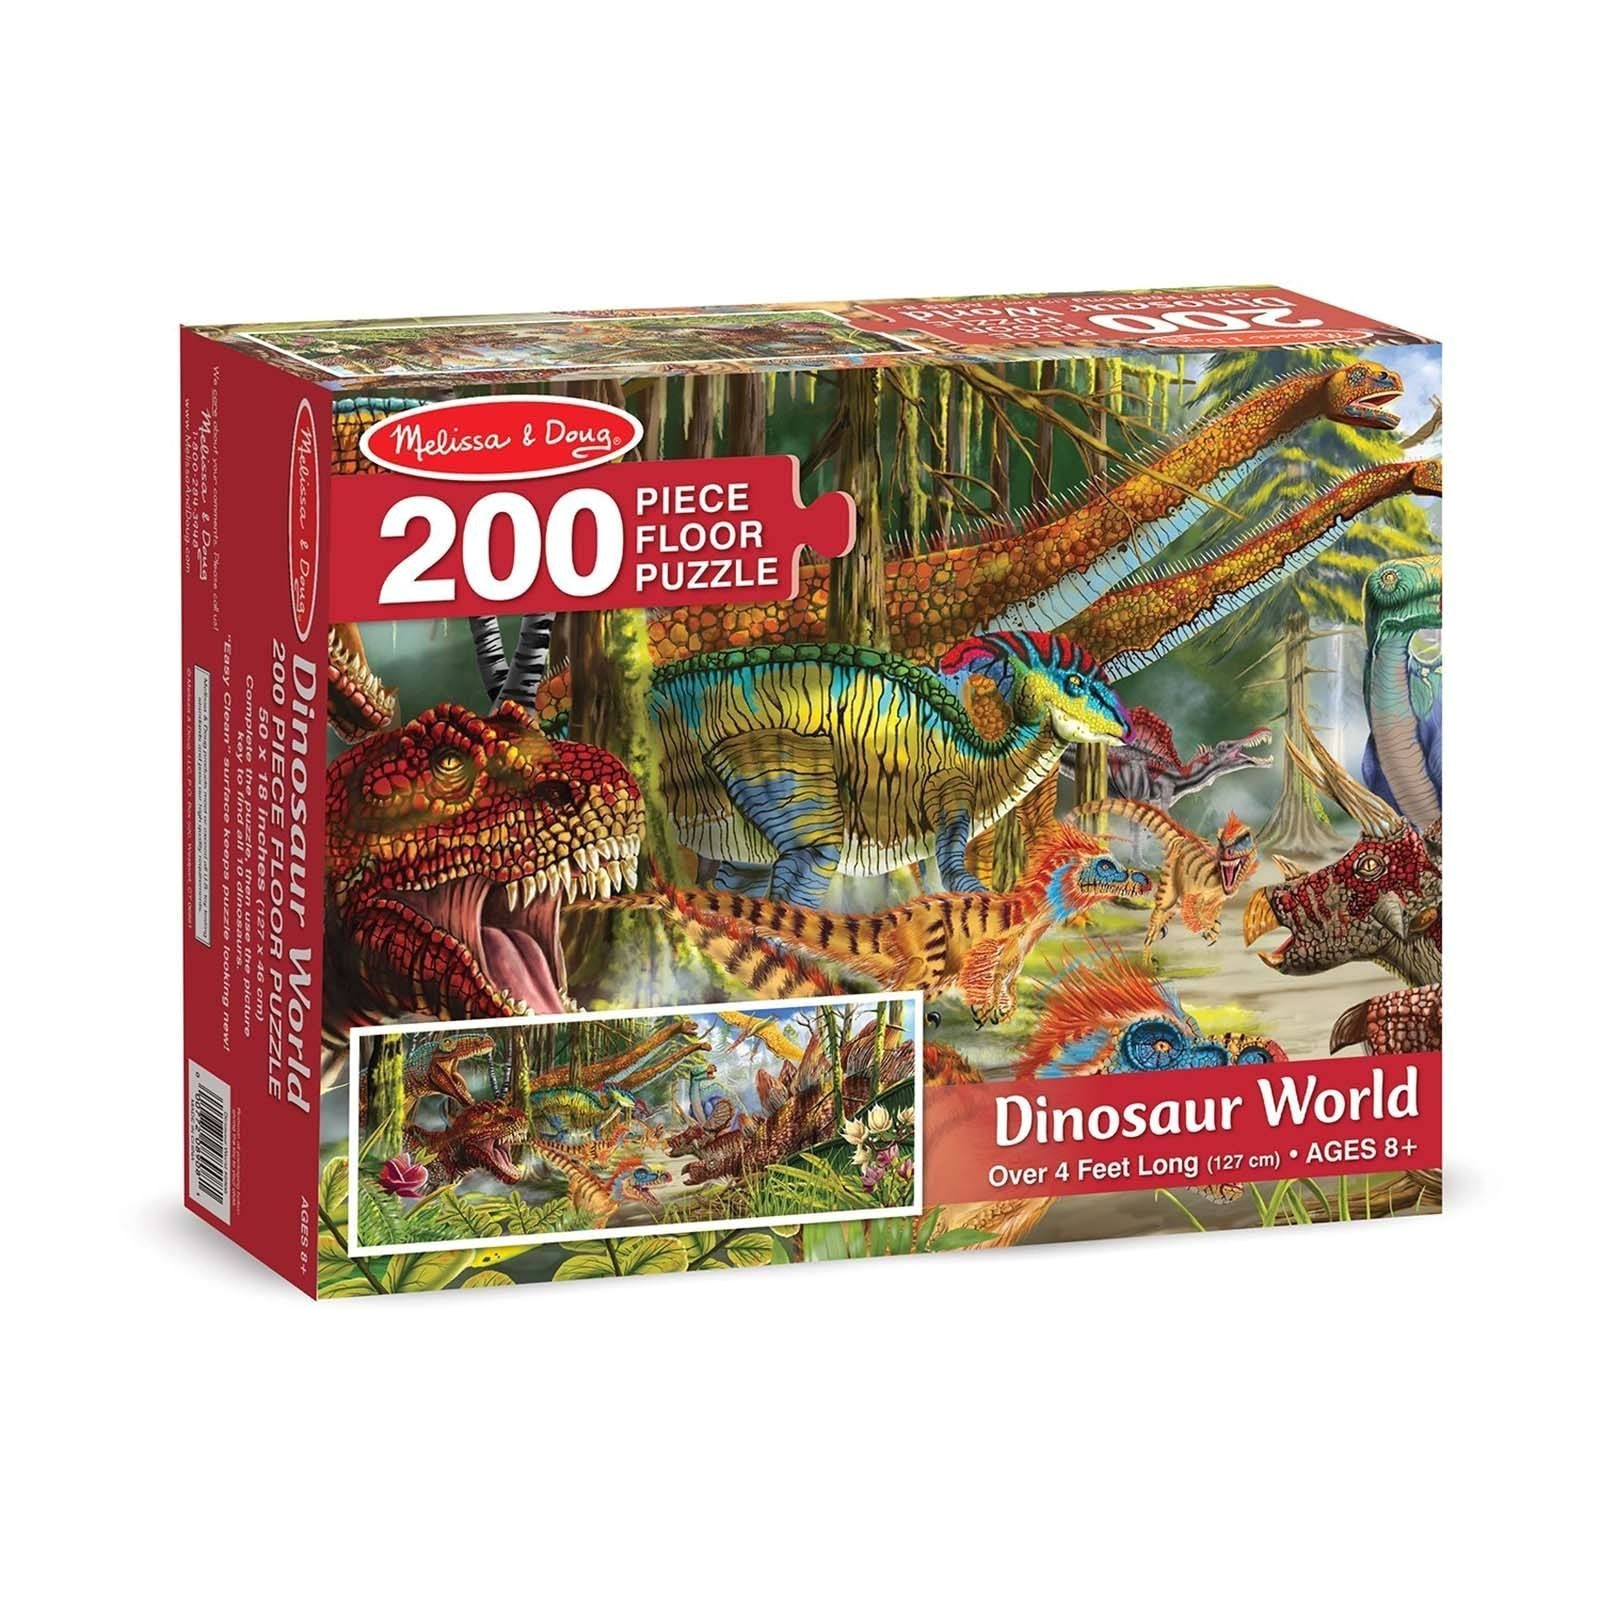 melissa and doug dinosaur world 200 piece floor puzzle